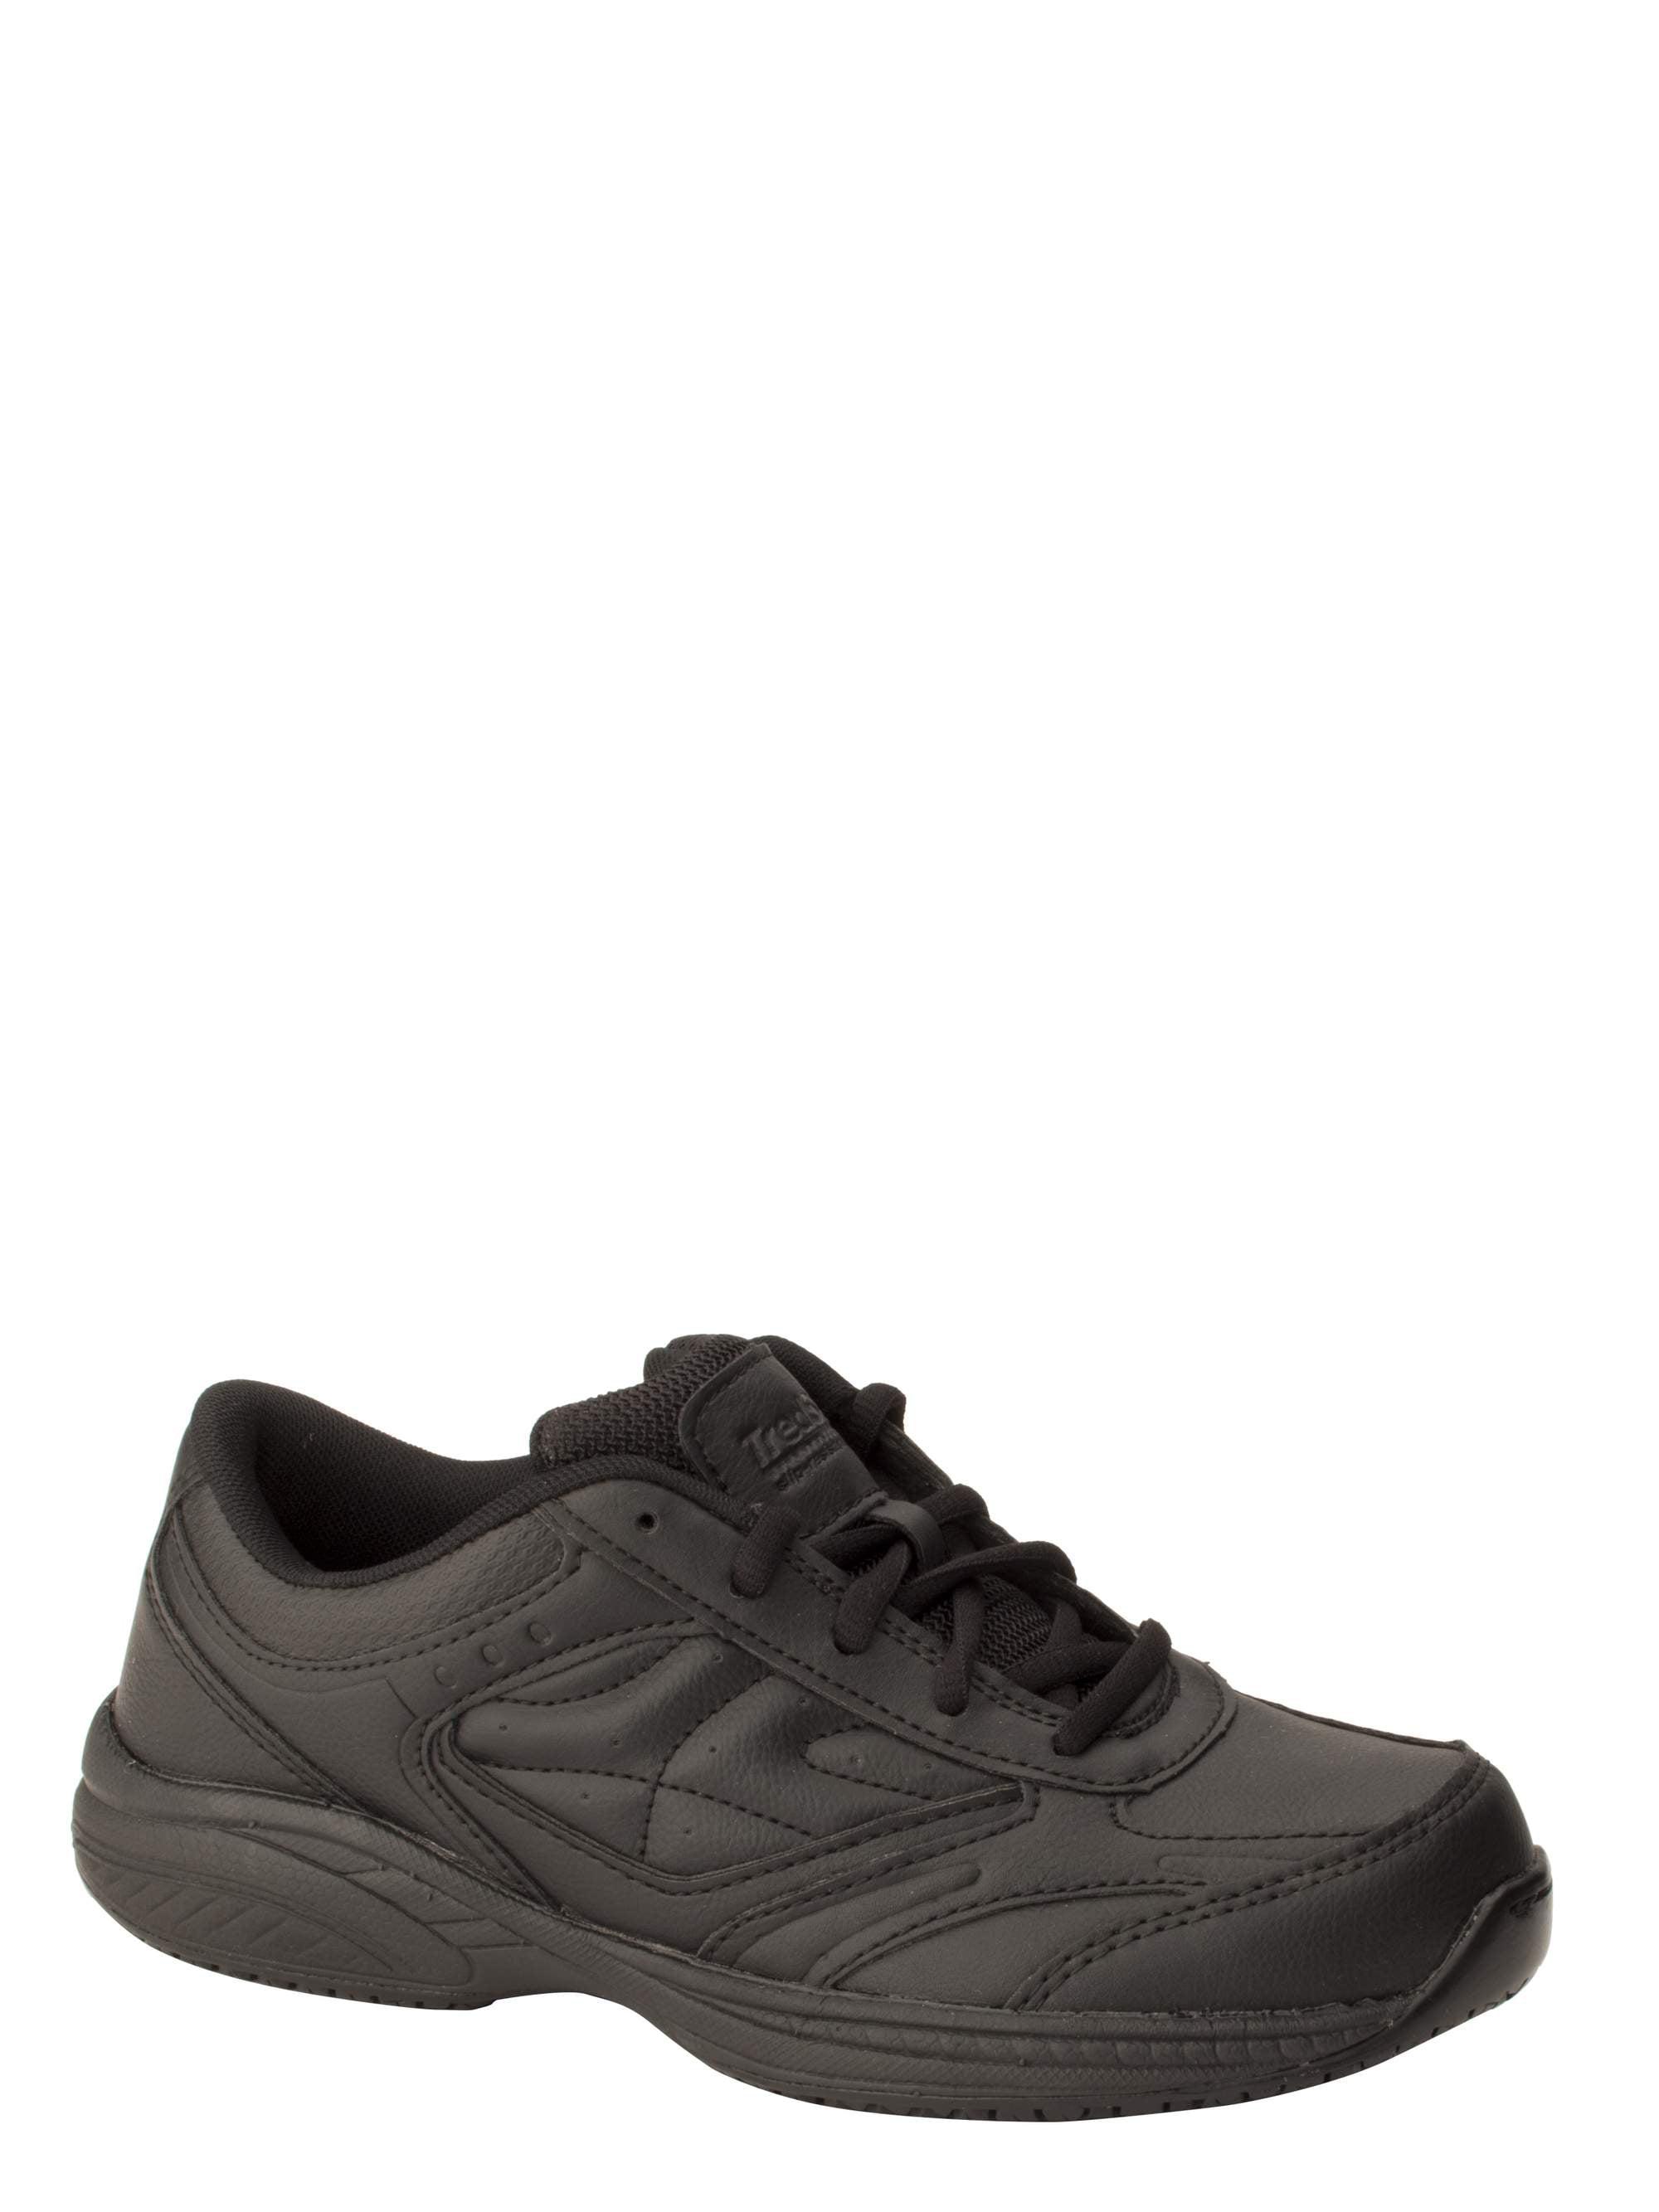 Tredsafe Women's Bailey Slip-Resistant Athletic Shoe, Wide Width by HYI